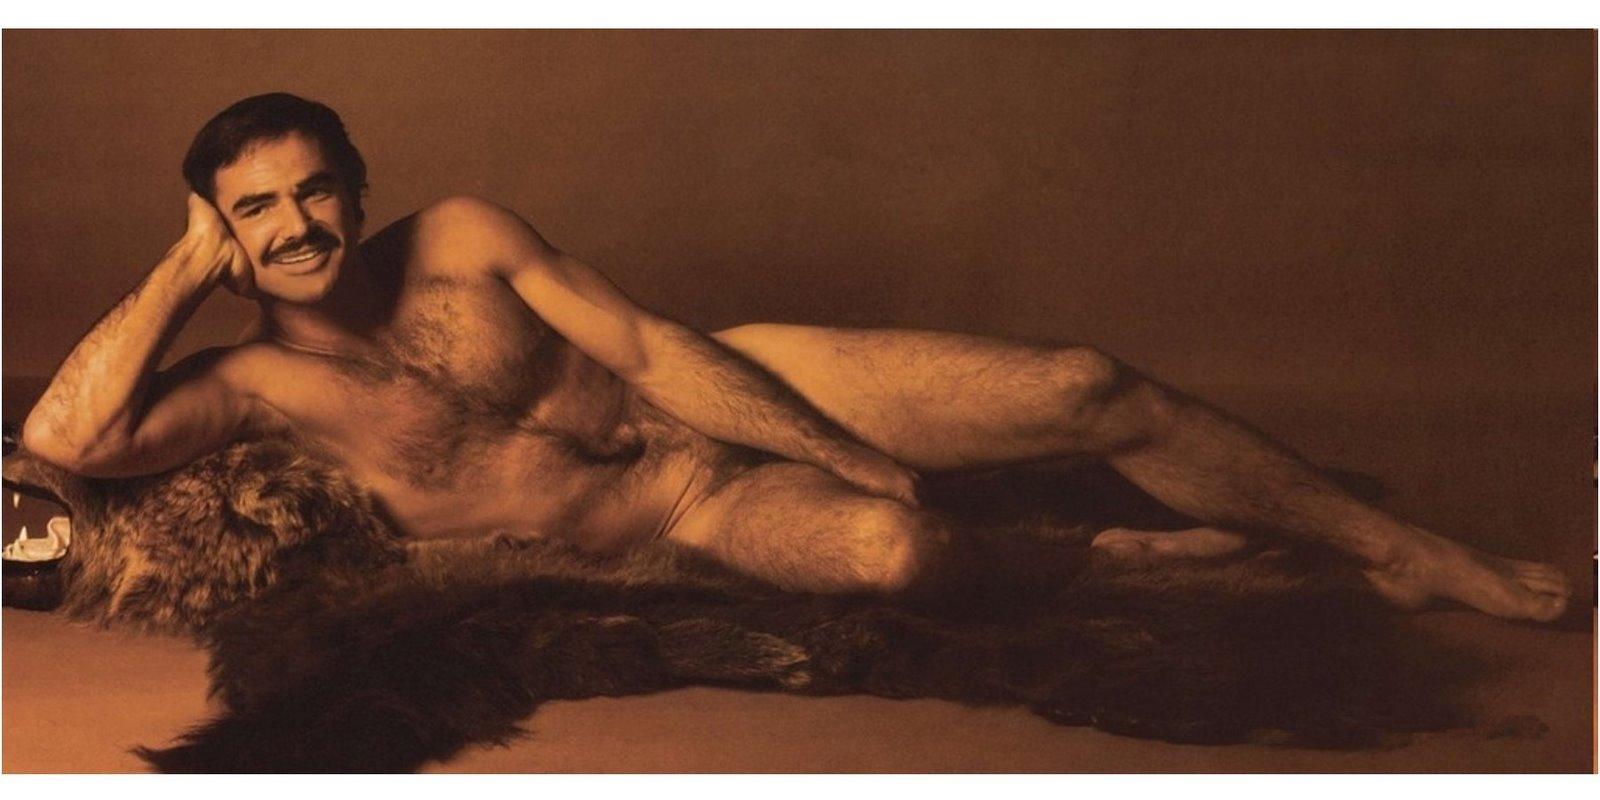 Naked-Burt-766000